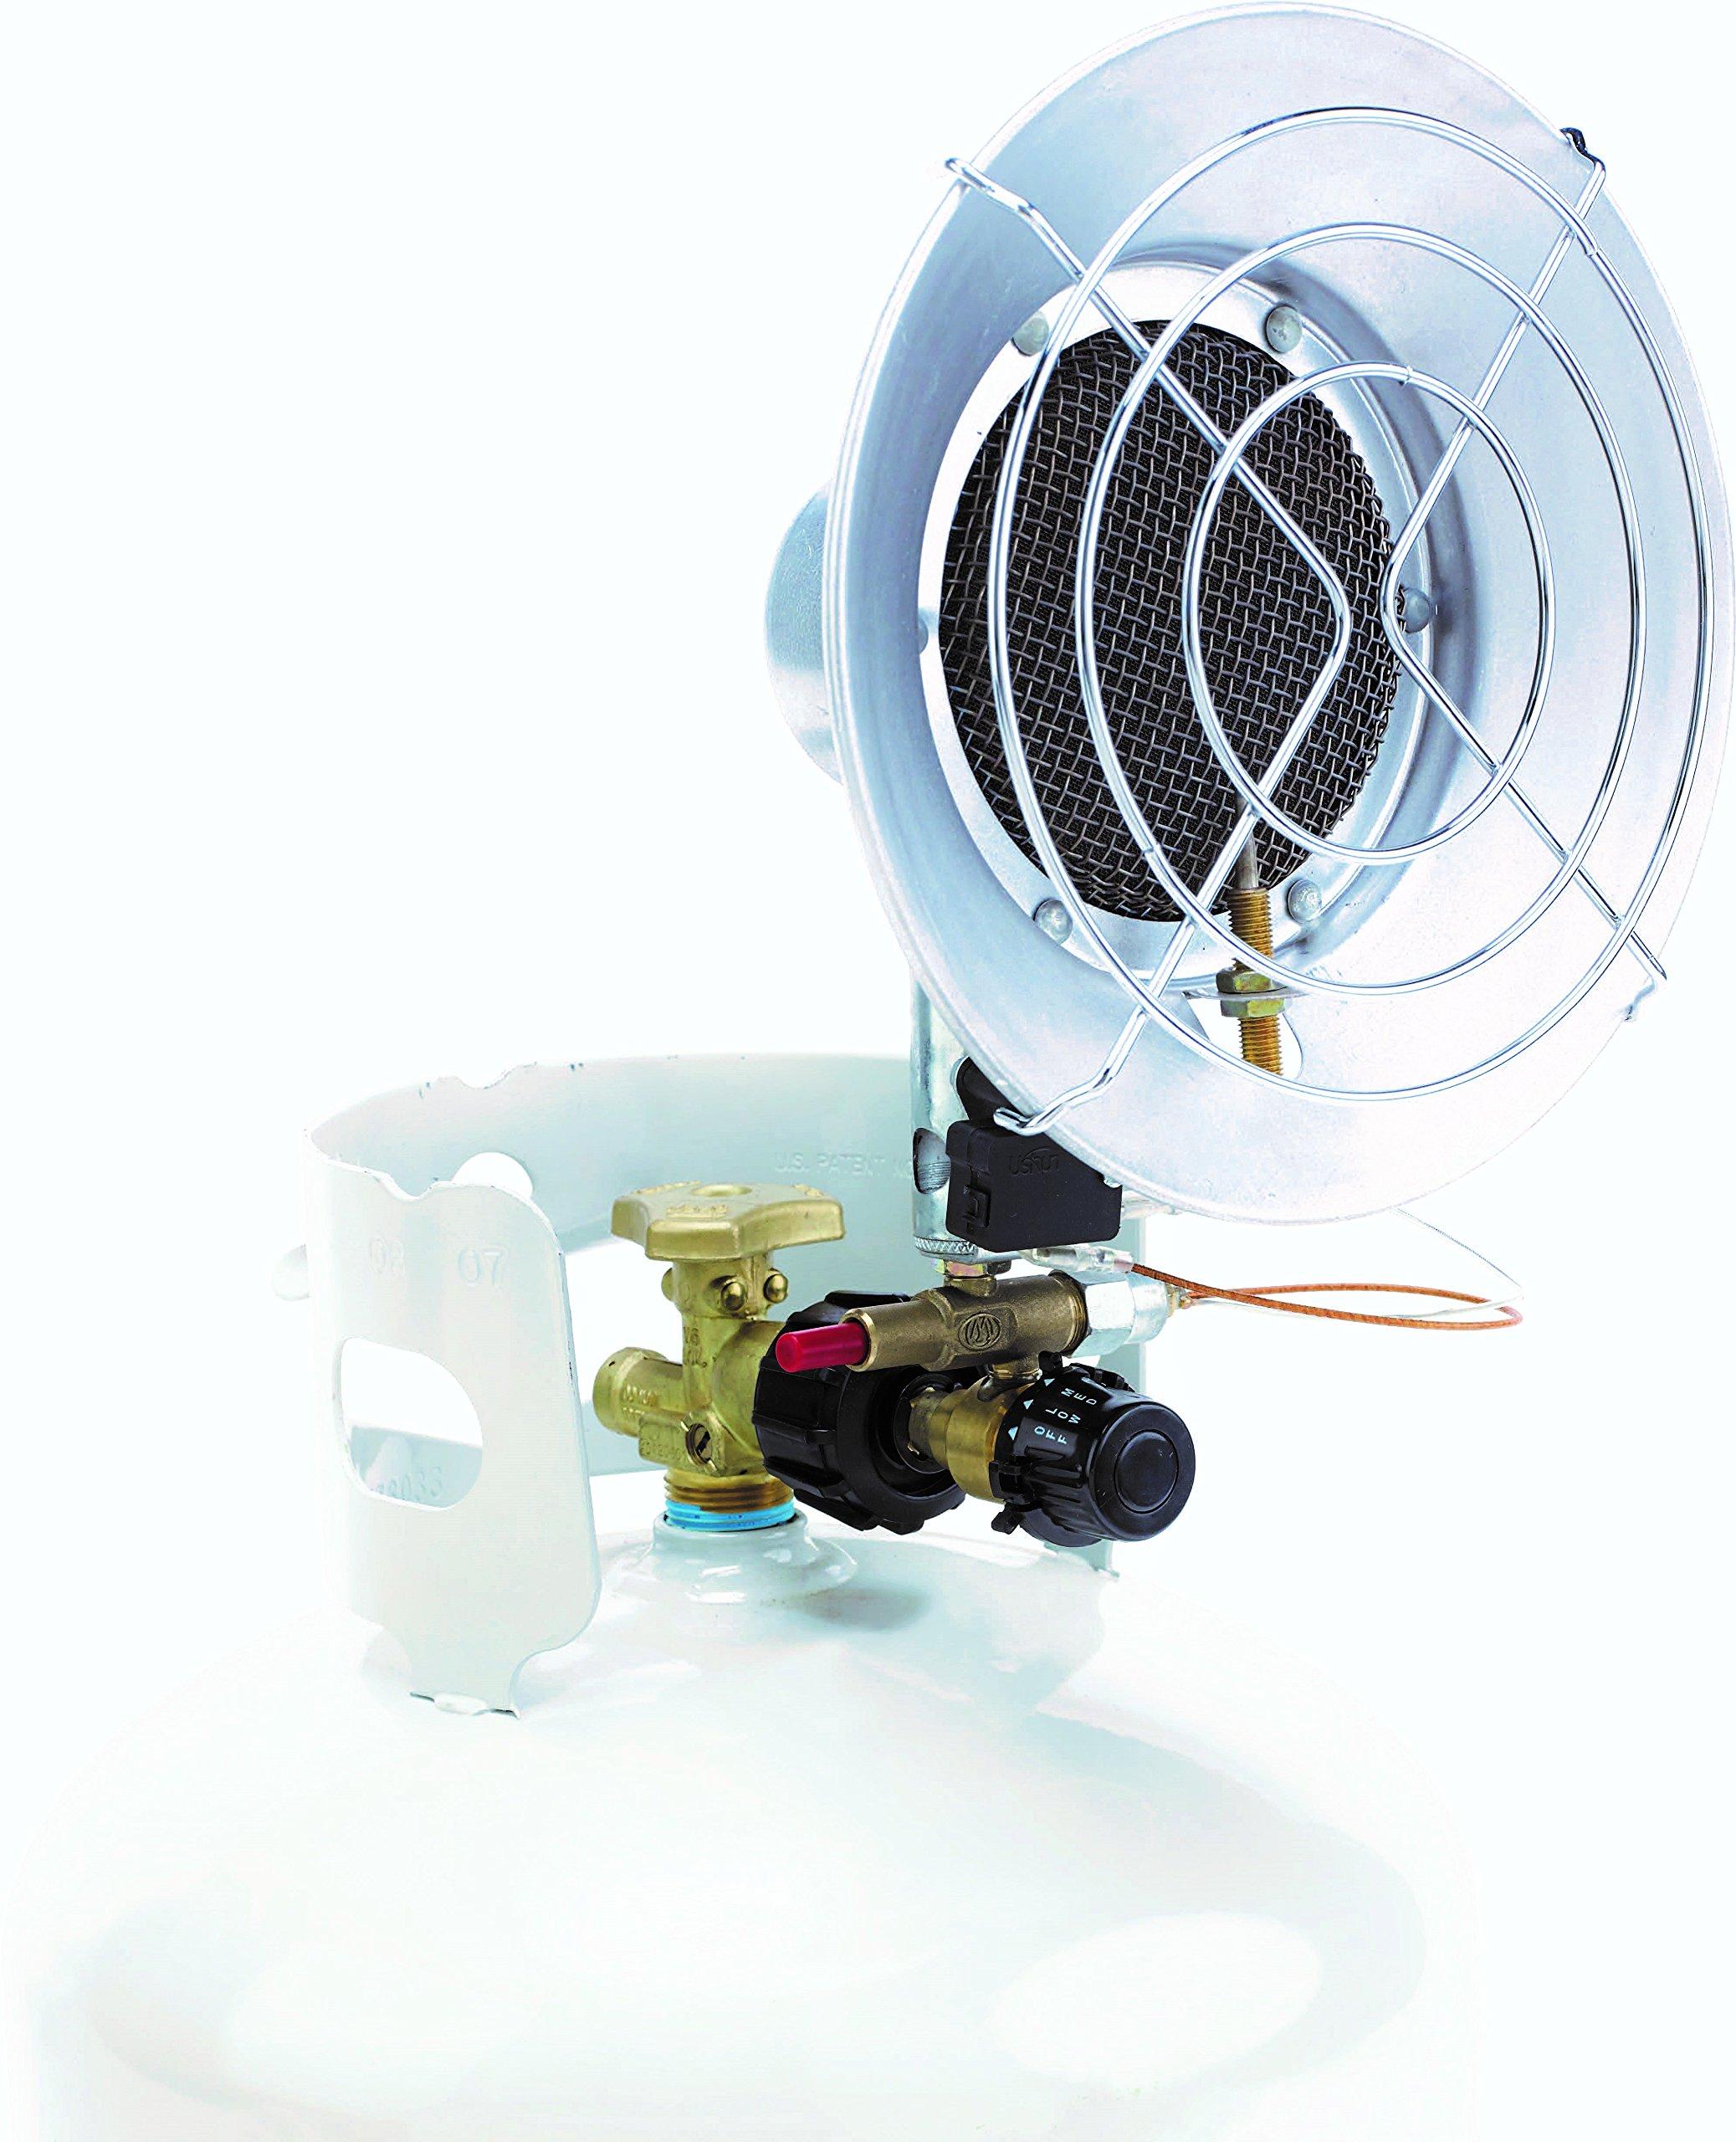 AZ Patio LP-5000-BS Single Tank Top Heater